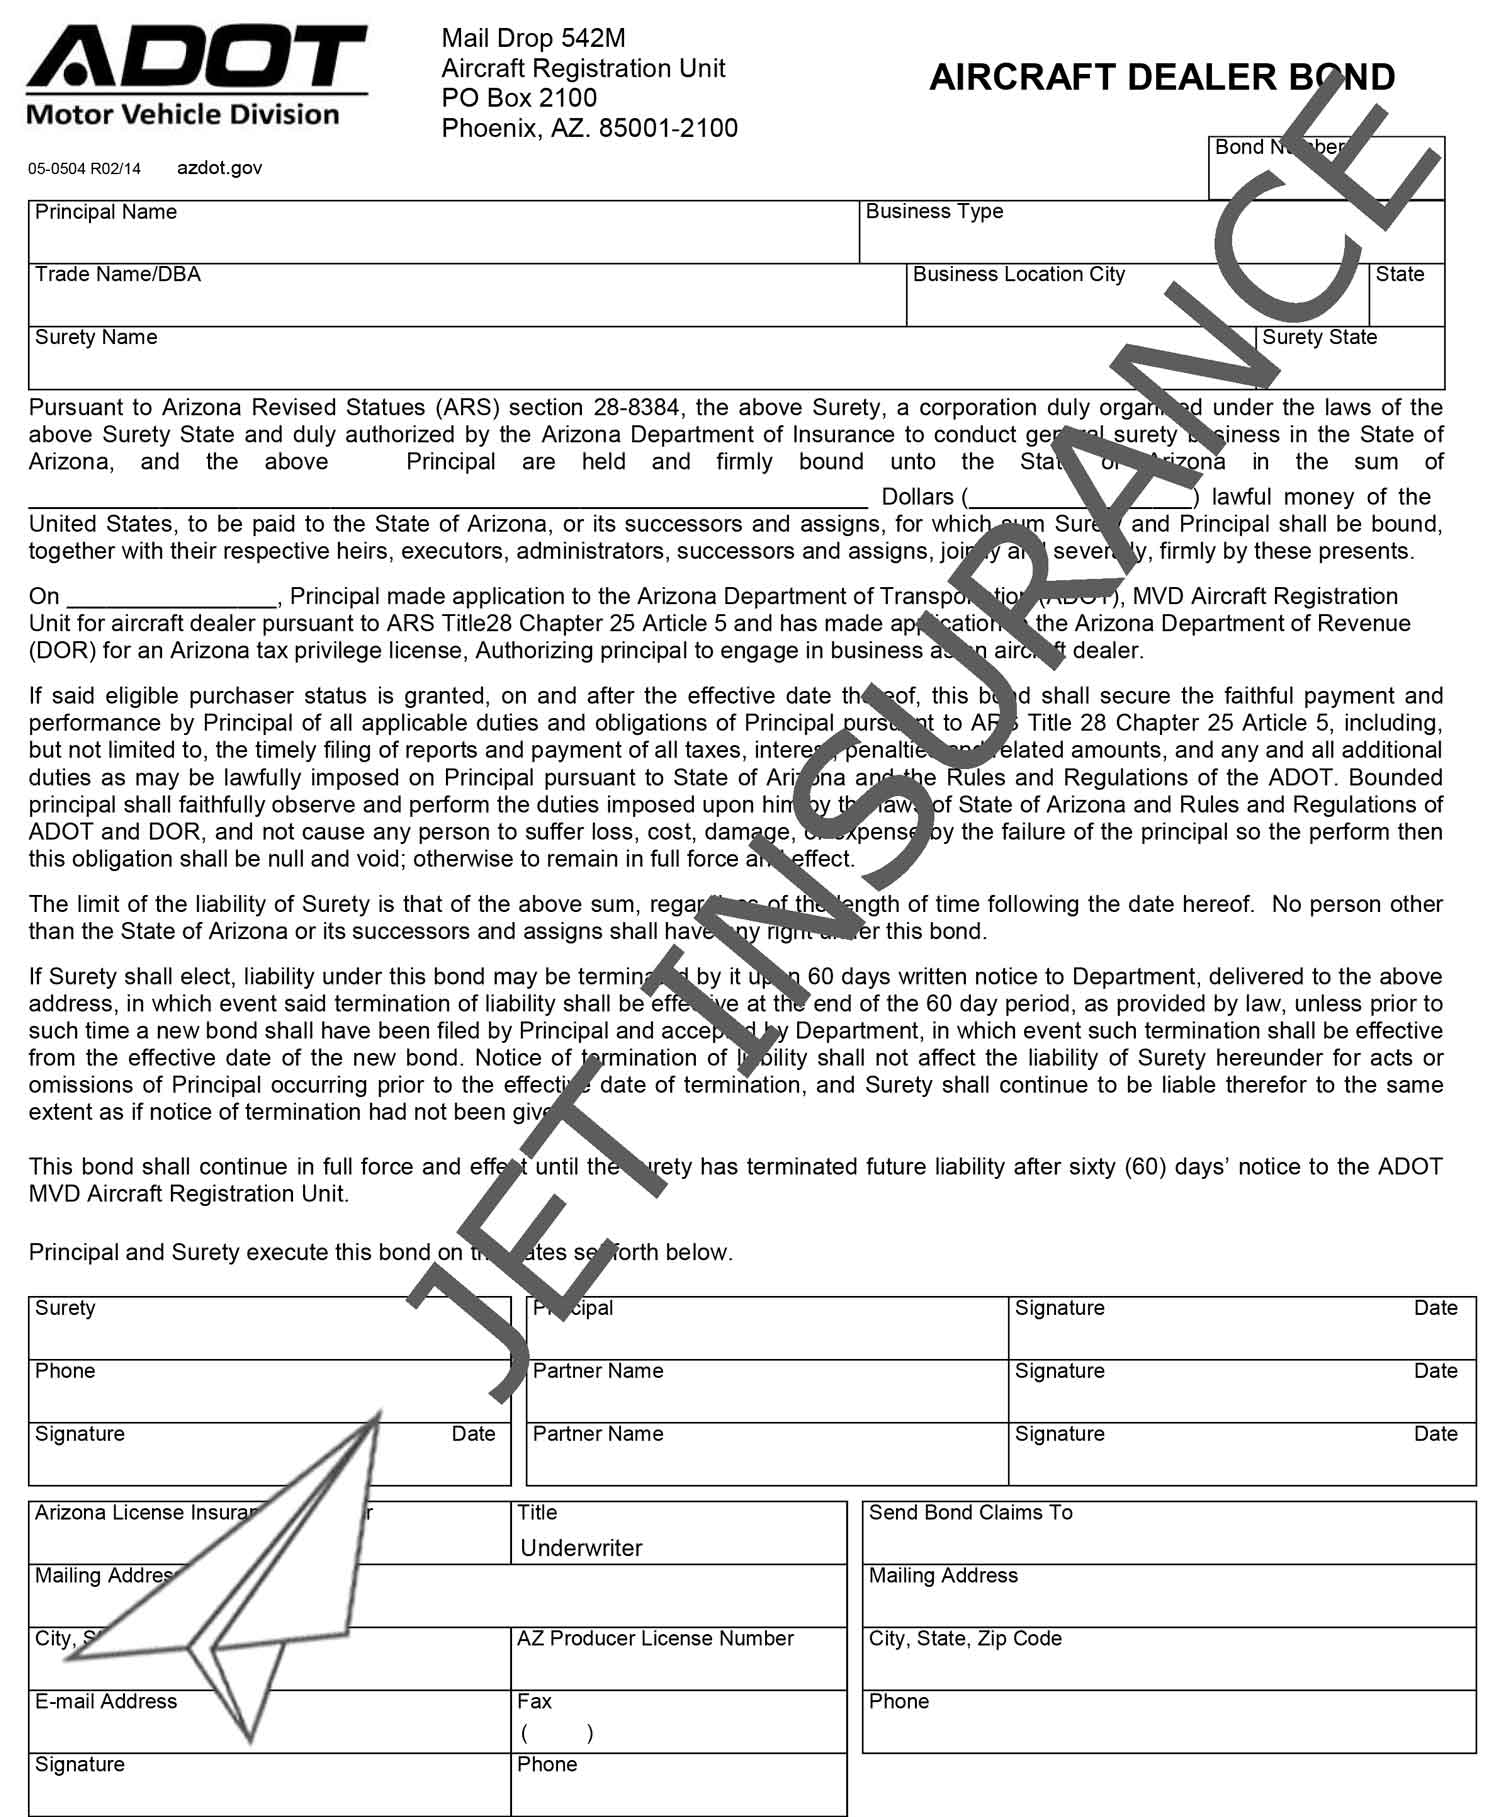 Arizona Aircraft Dealer Bond Form